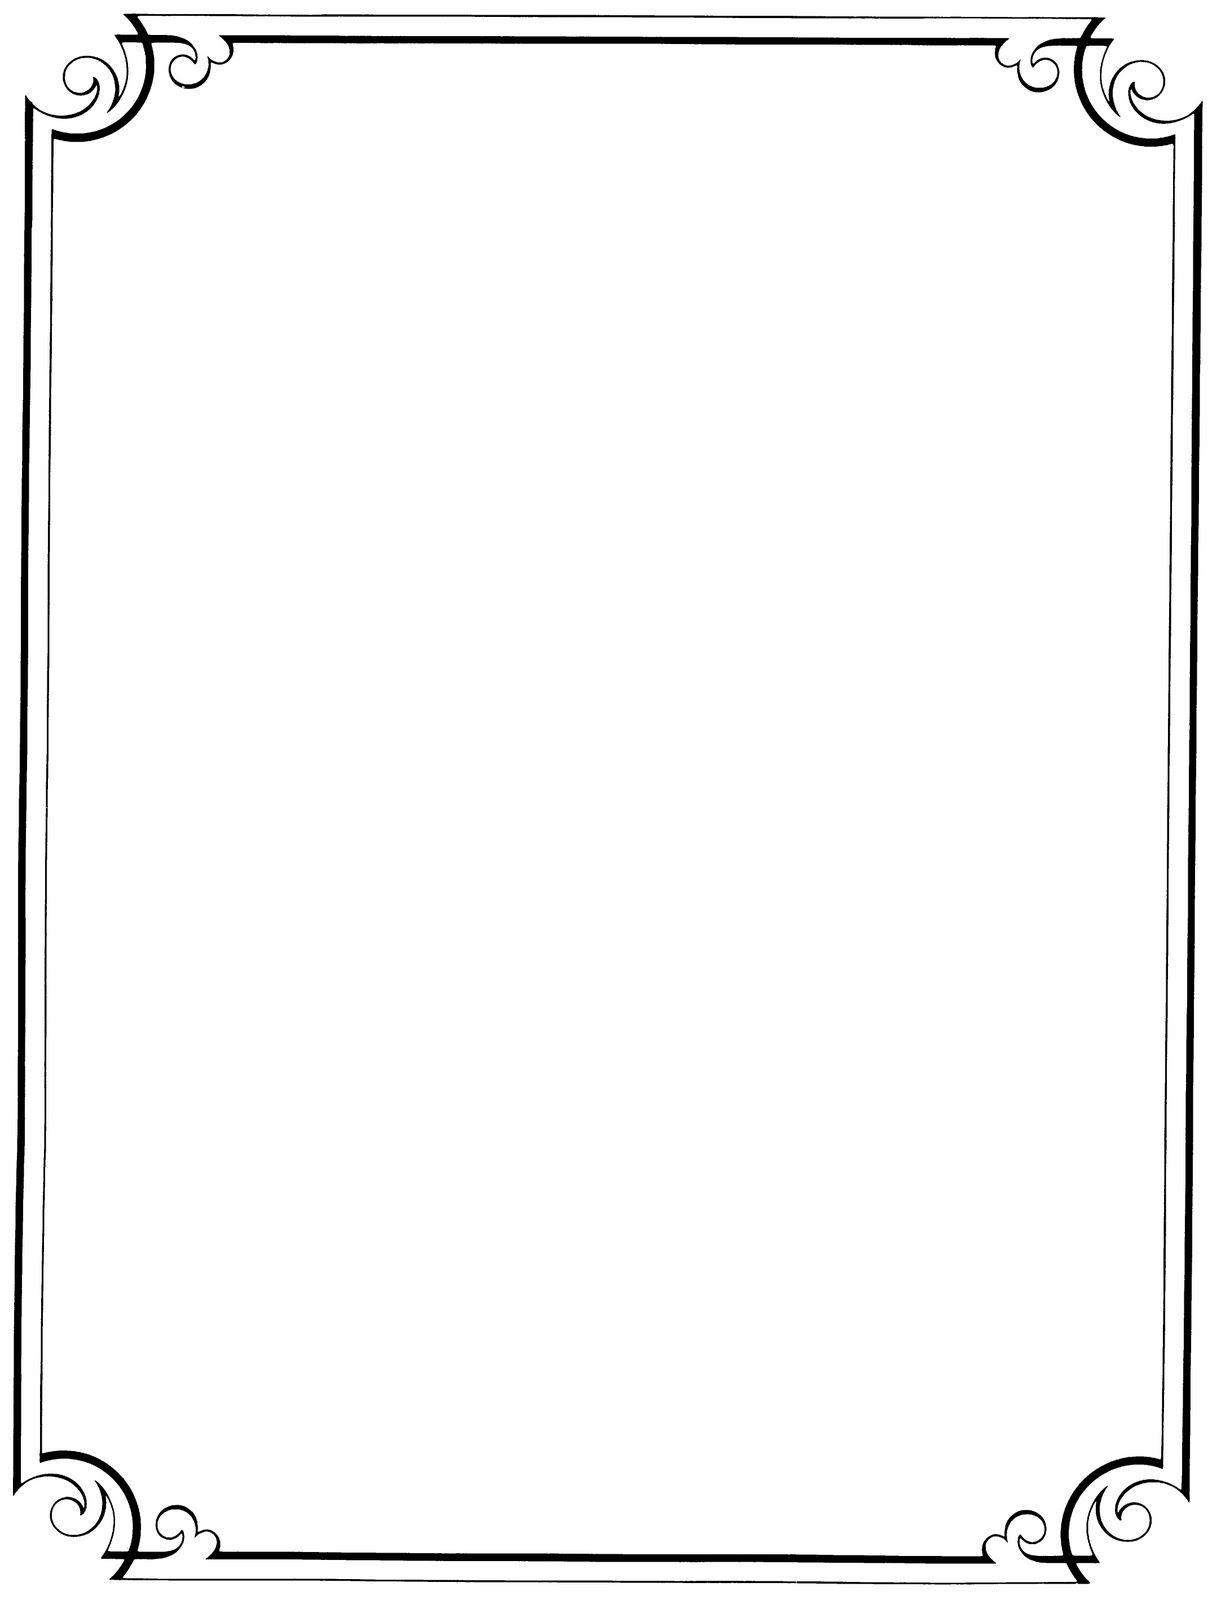 Free Printable Clip Art Borders |  : Free Vintage Clip Art - Free Printable Page Borders